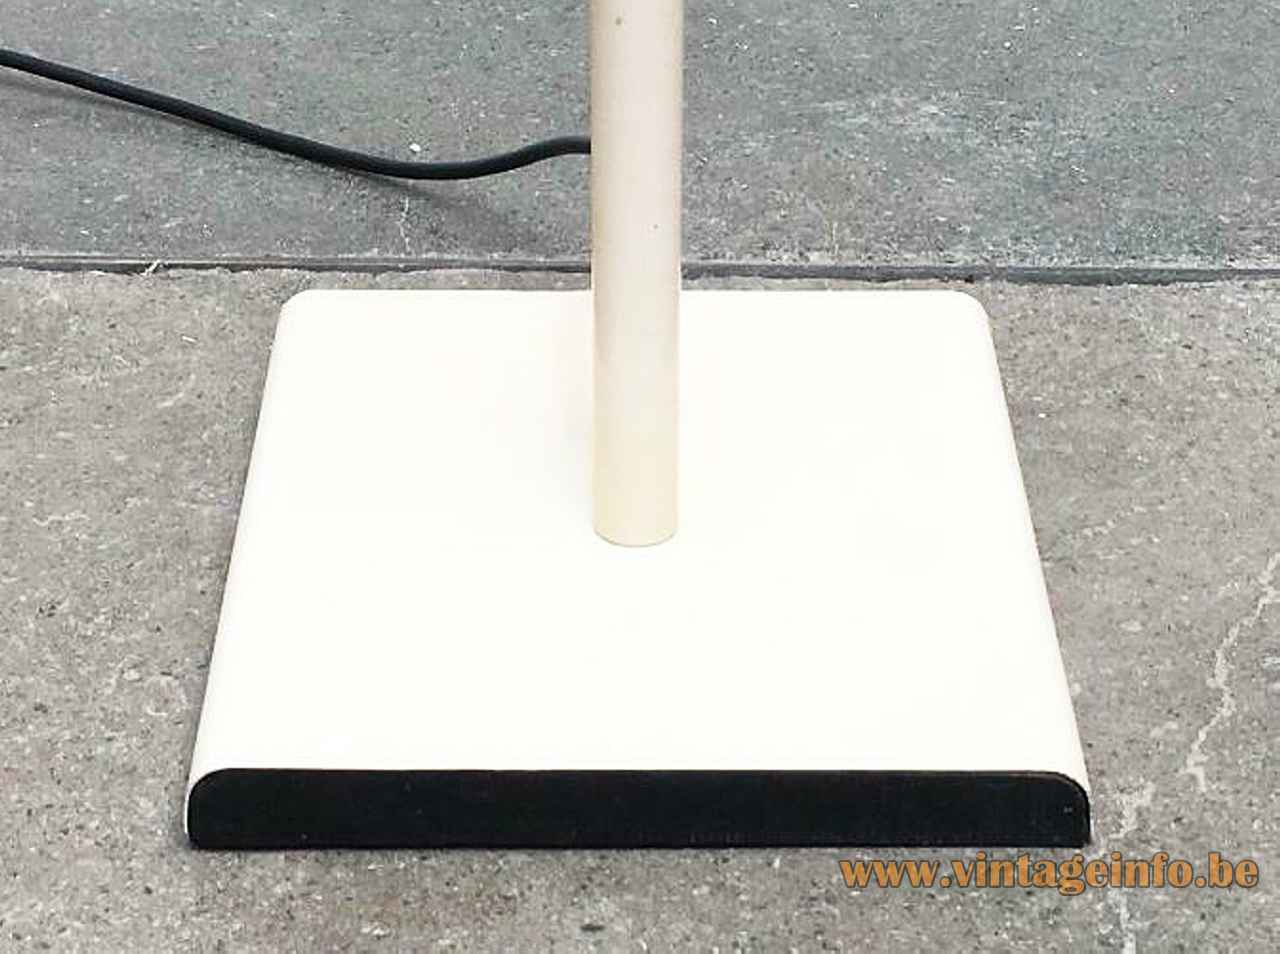 Conelight double floor lamp rectangular white base black bottom white rod 1970s United Kingdom Ronald Holmes